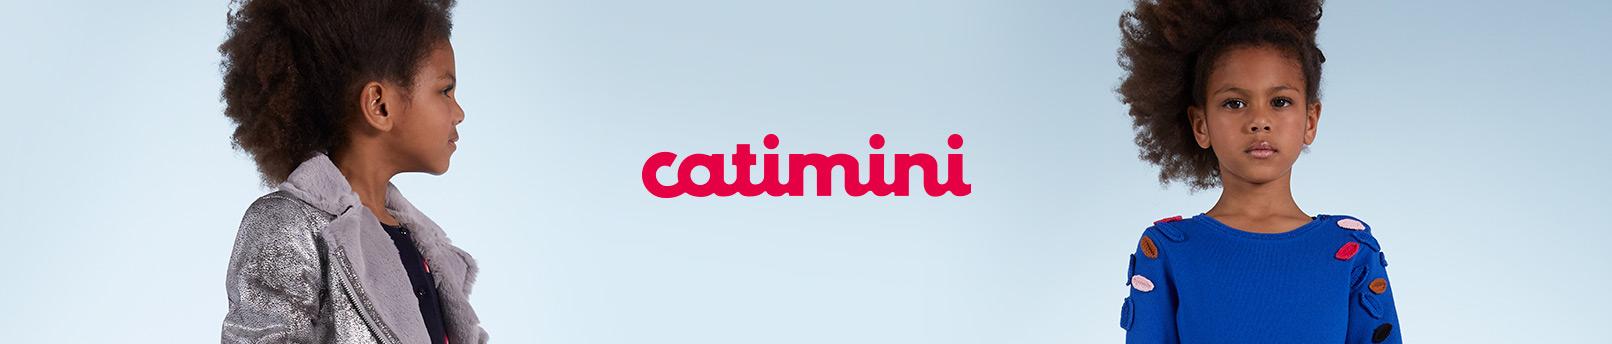 Discover Catimini